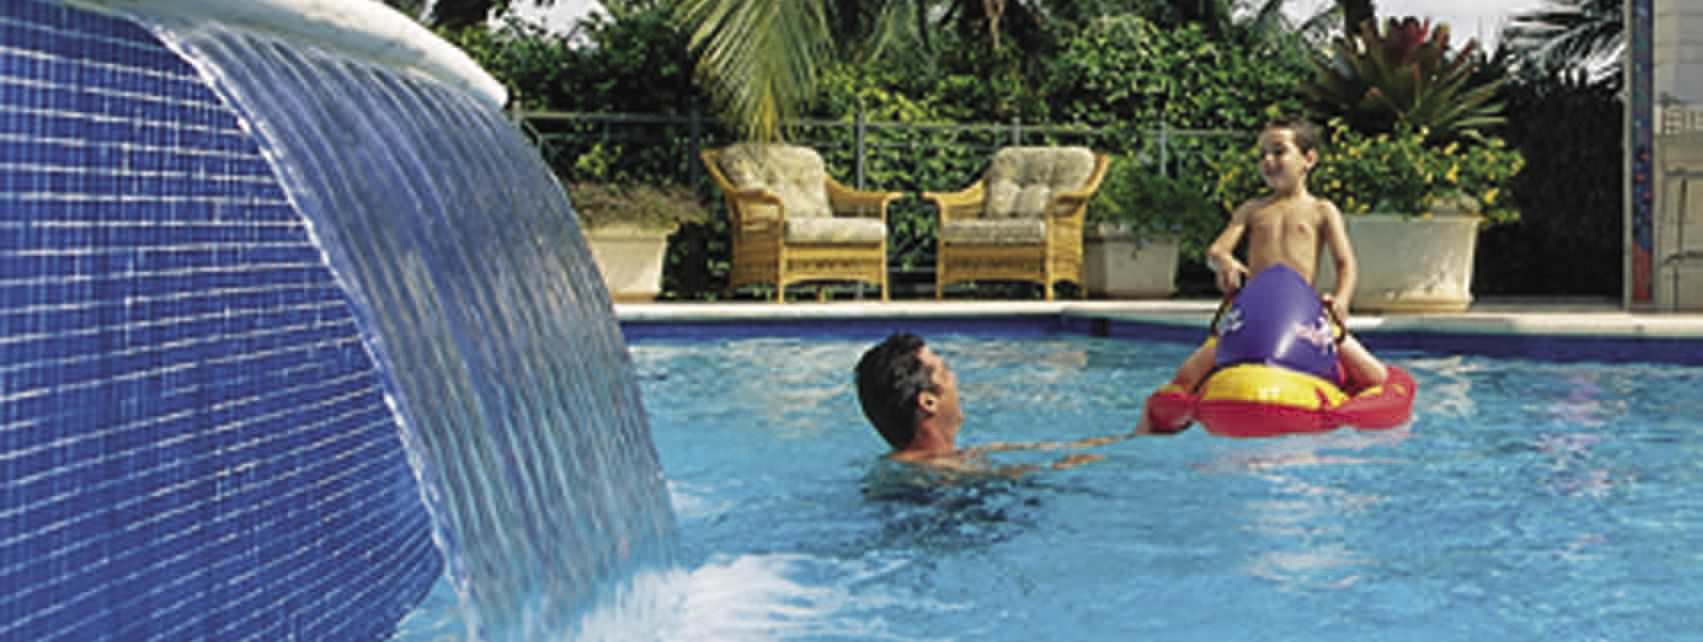 Swimming pool waterfall - MAGICFALLS™ - Pentair Aquatic ...